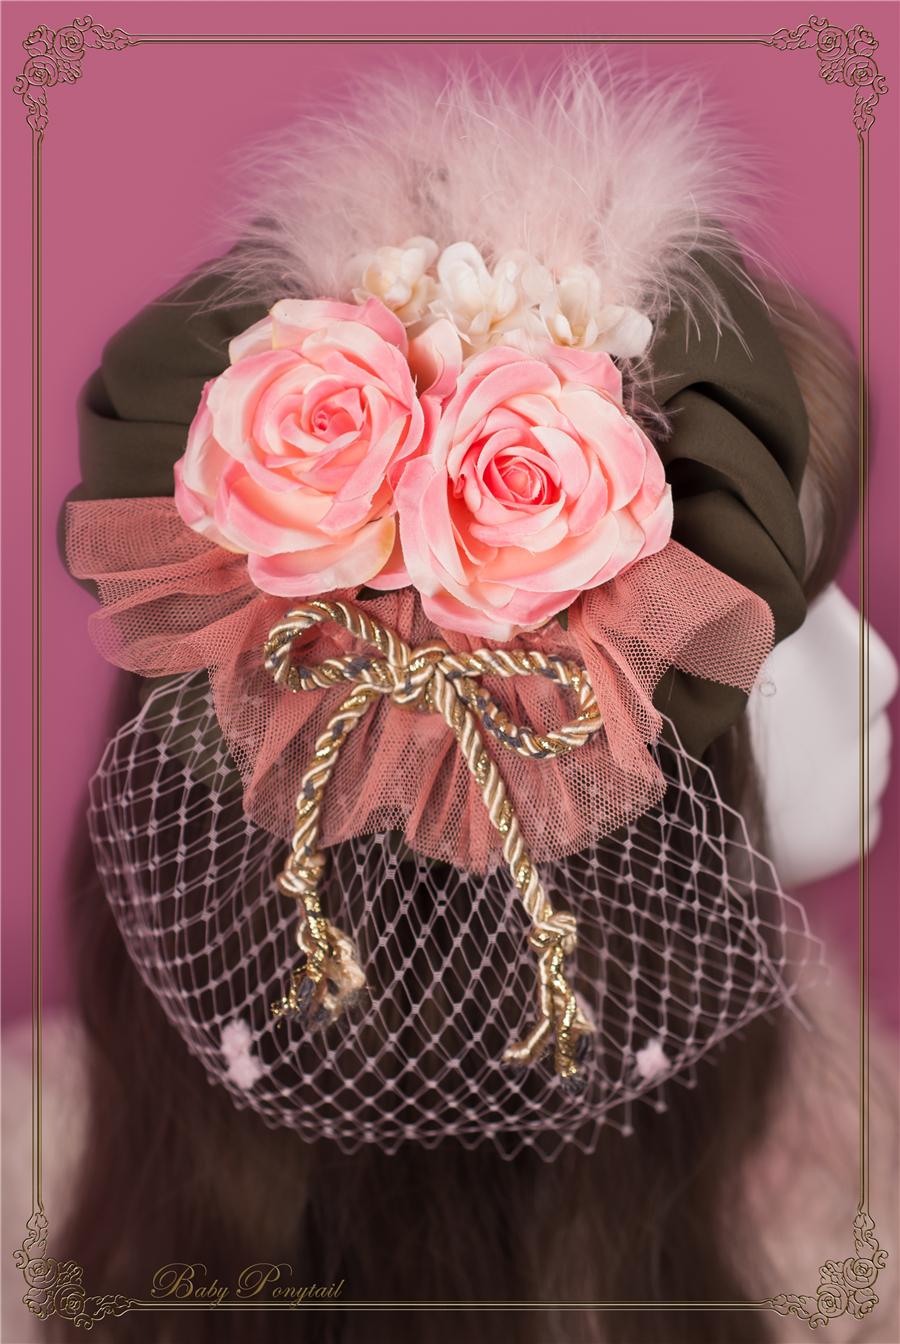 Babyponytail_Accessory_Victorian Garden Head Dress_2.jpg